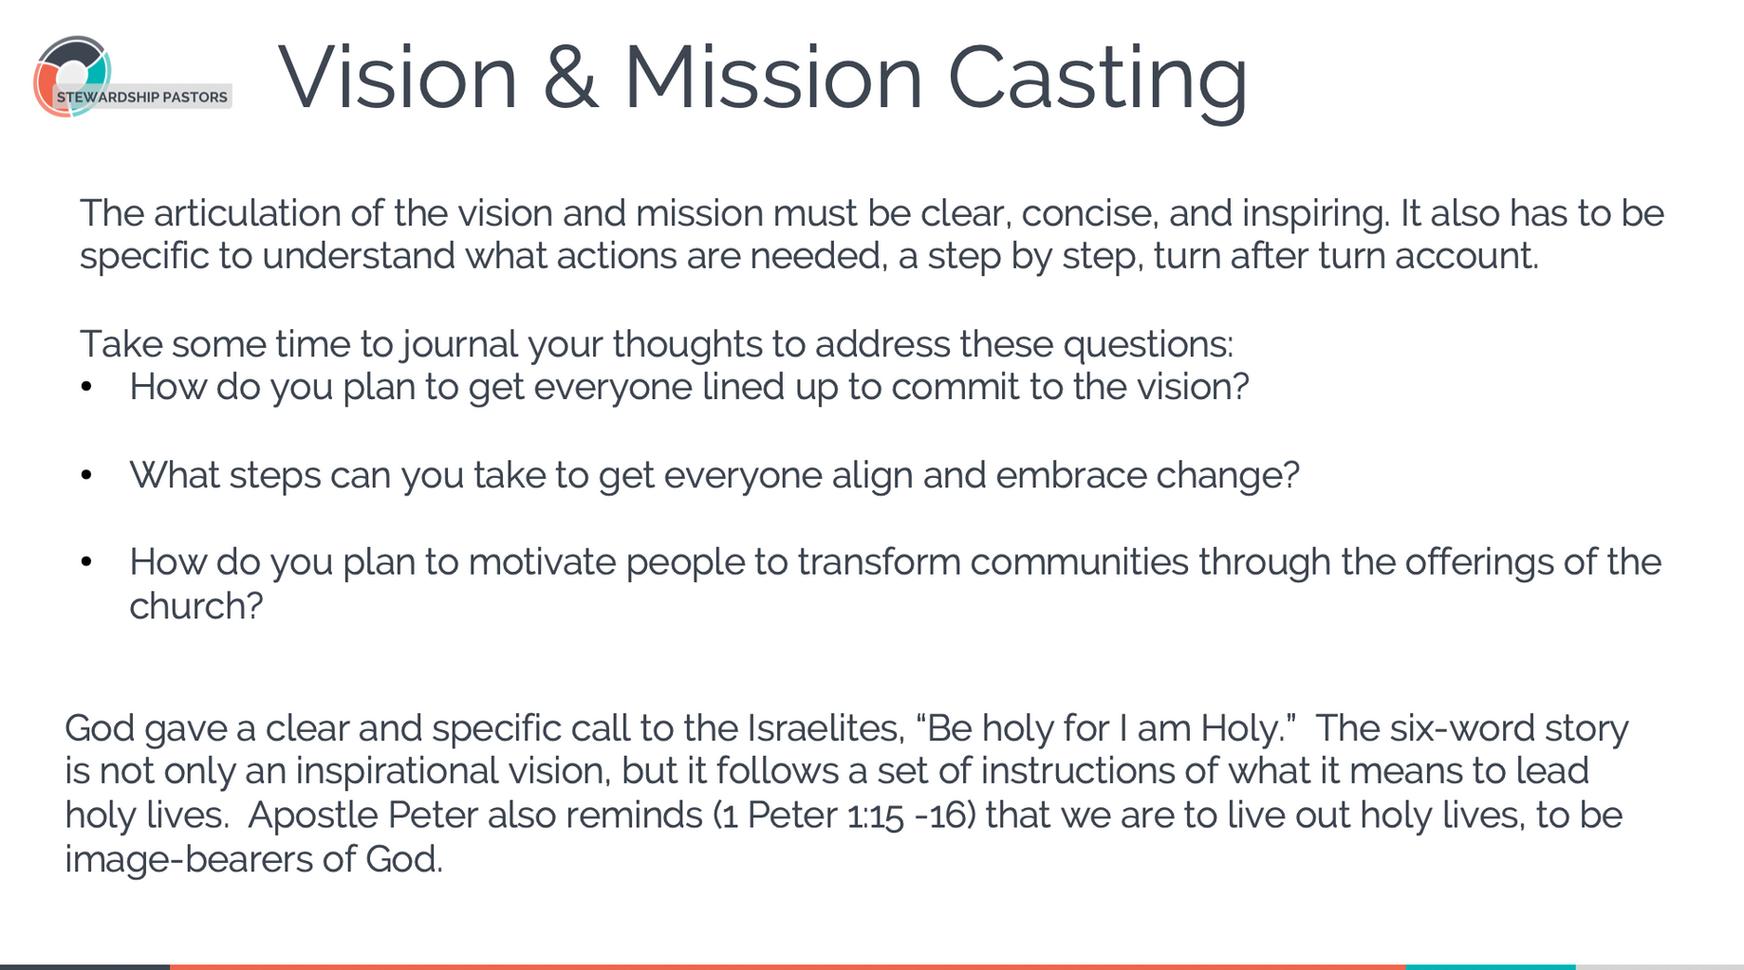 Vision & Mission Casting